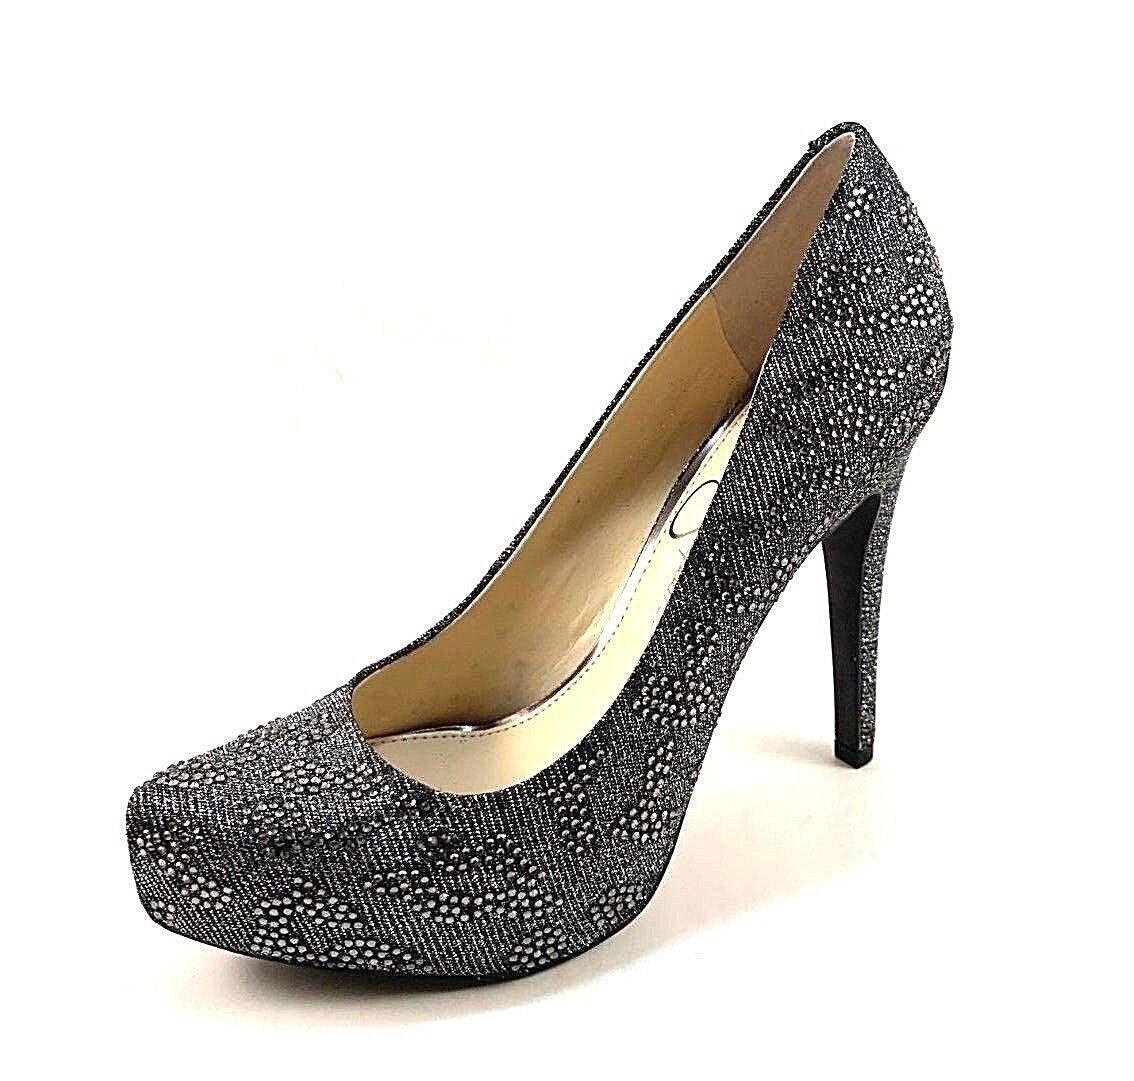 Jessica Simpson Parisah 4 Pewter Multi High High High Heel Platform Dressy Pumps 94a740